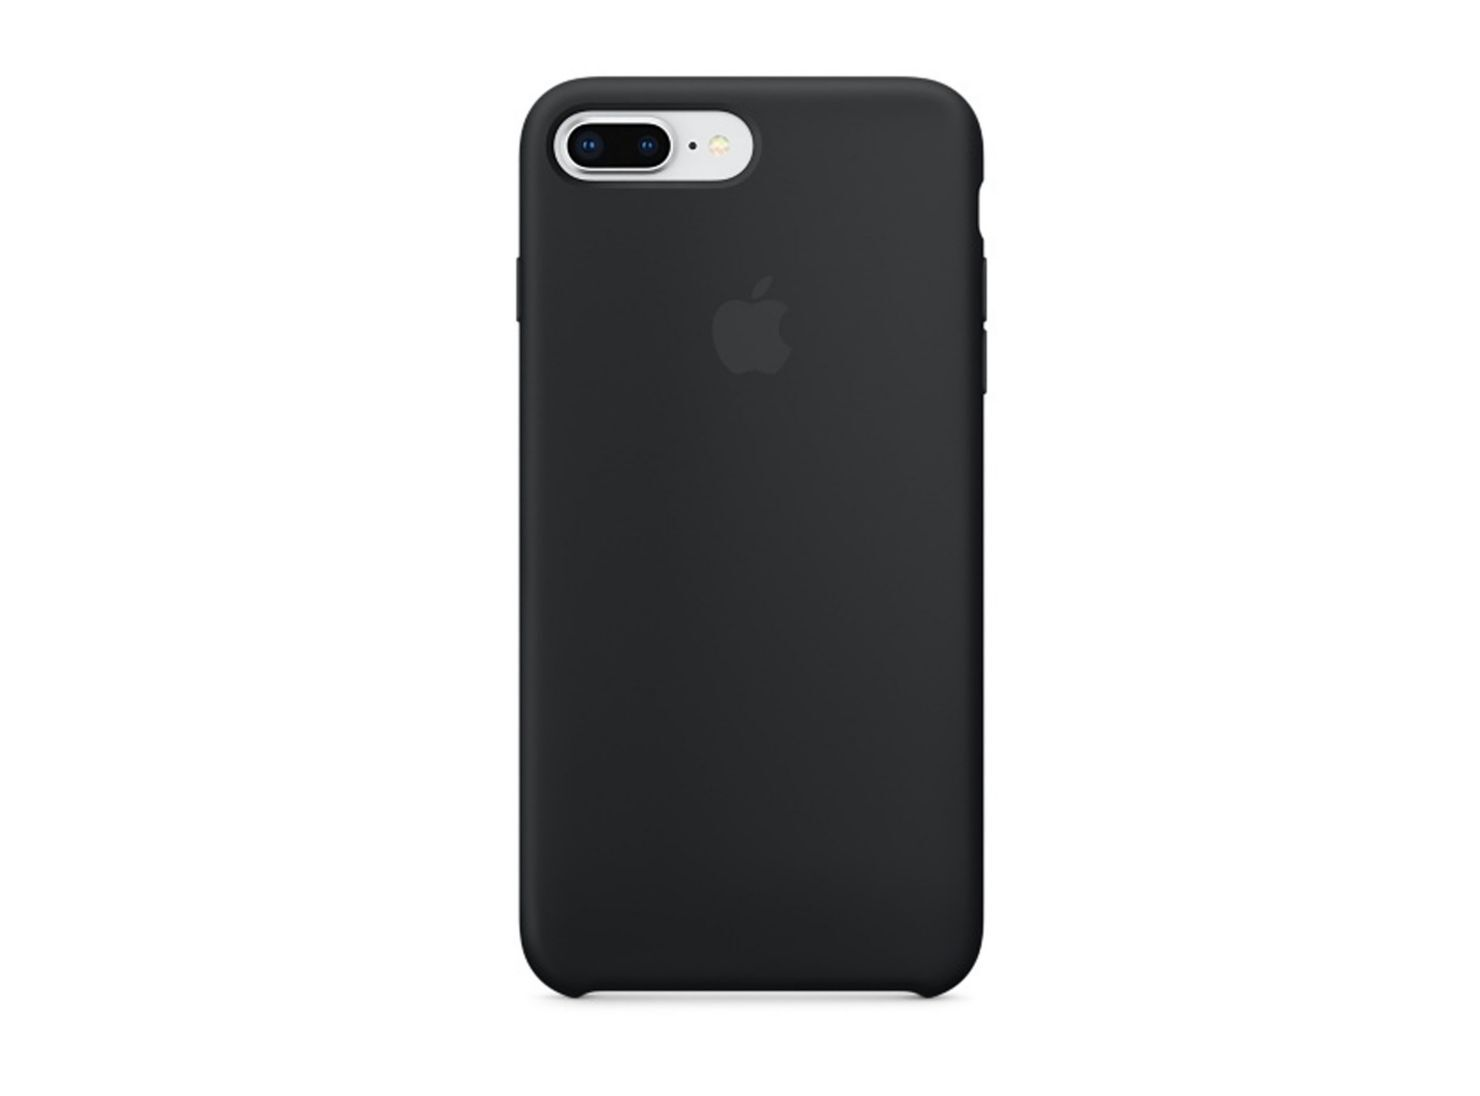 b91cd43df2e ... Silicona Apple iPhone 7 Plus/8 Plus Negro. Carcasa%20Silicona%20Apple%20iPhone%207%20Plus%2F8%20Plus%  ...